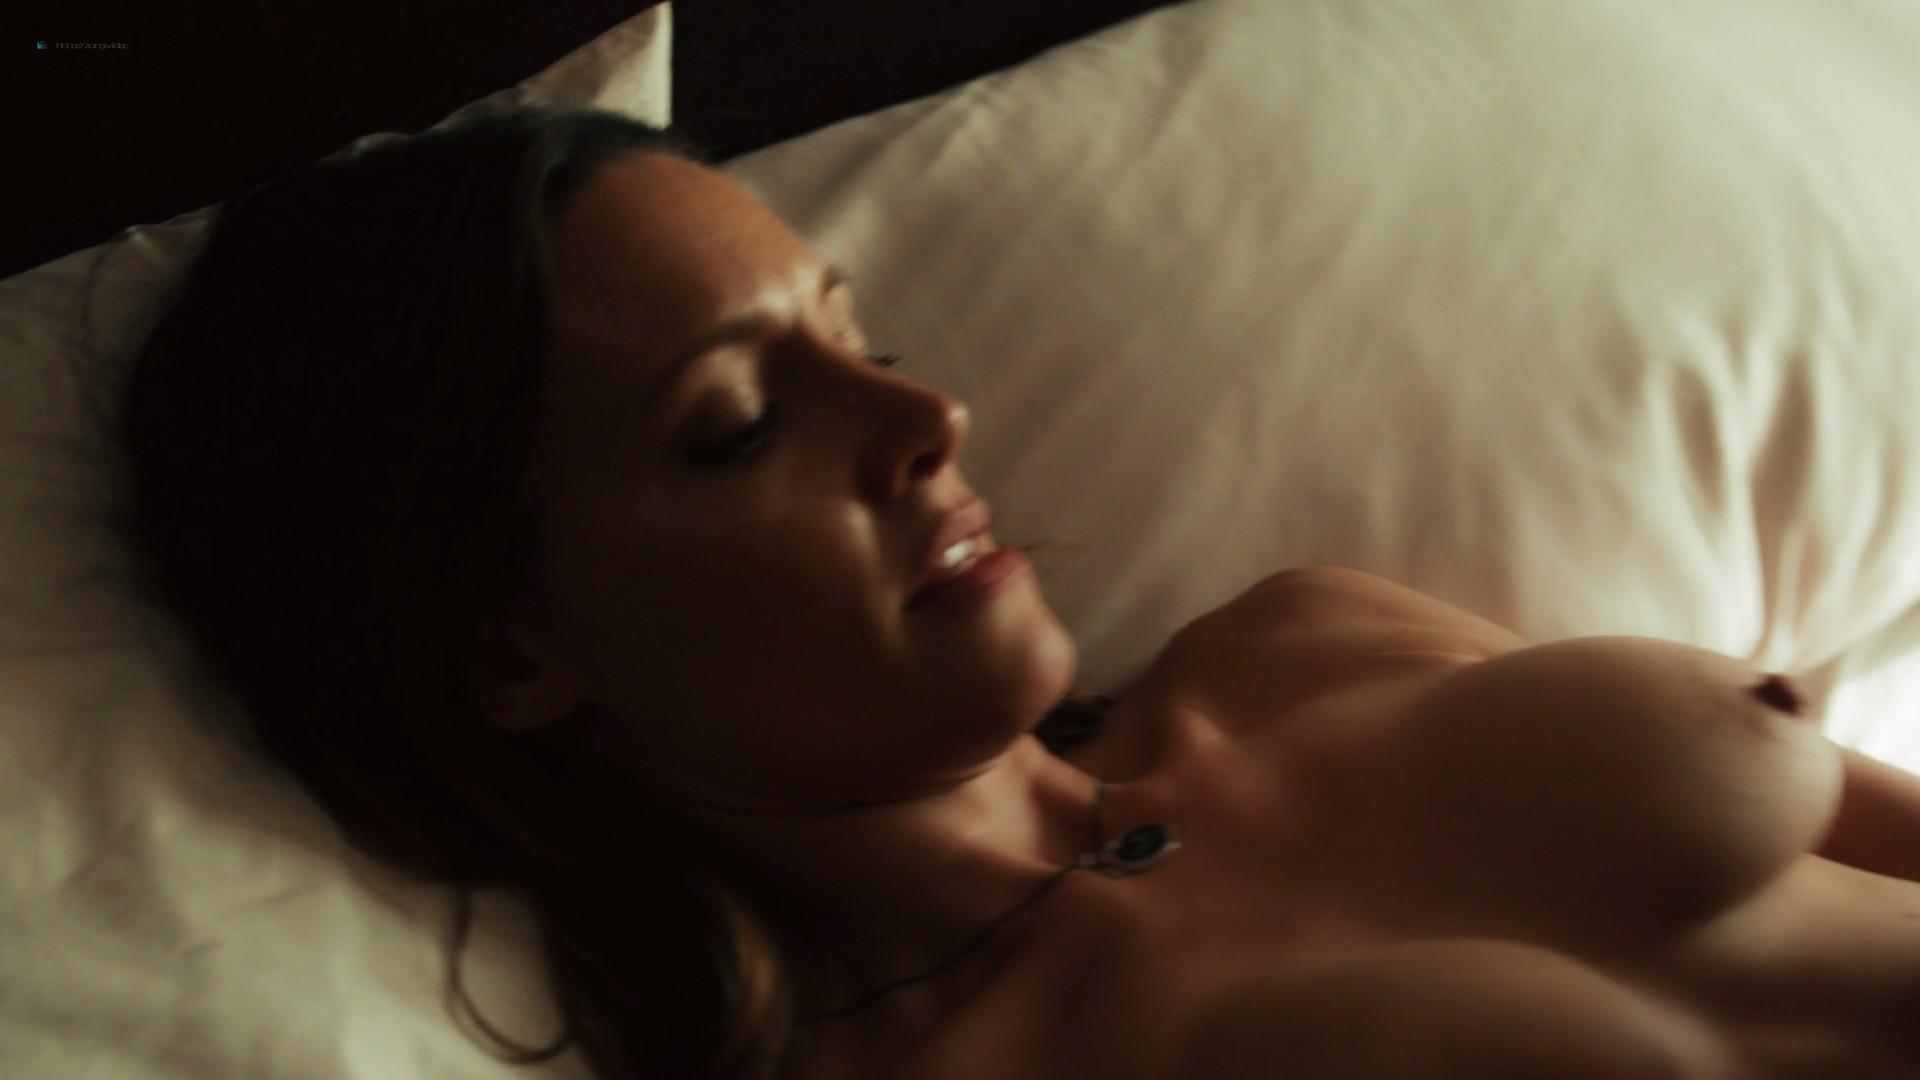 Emmanuelle Chriqui lesbian sex with KaDee Strickland nude topless - Shut Eye (2016) s1e1 1080p (4)